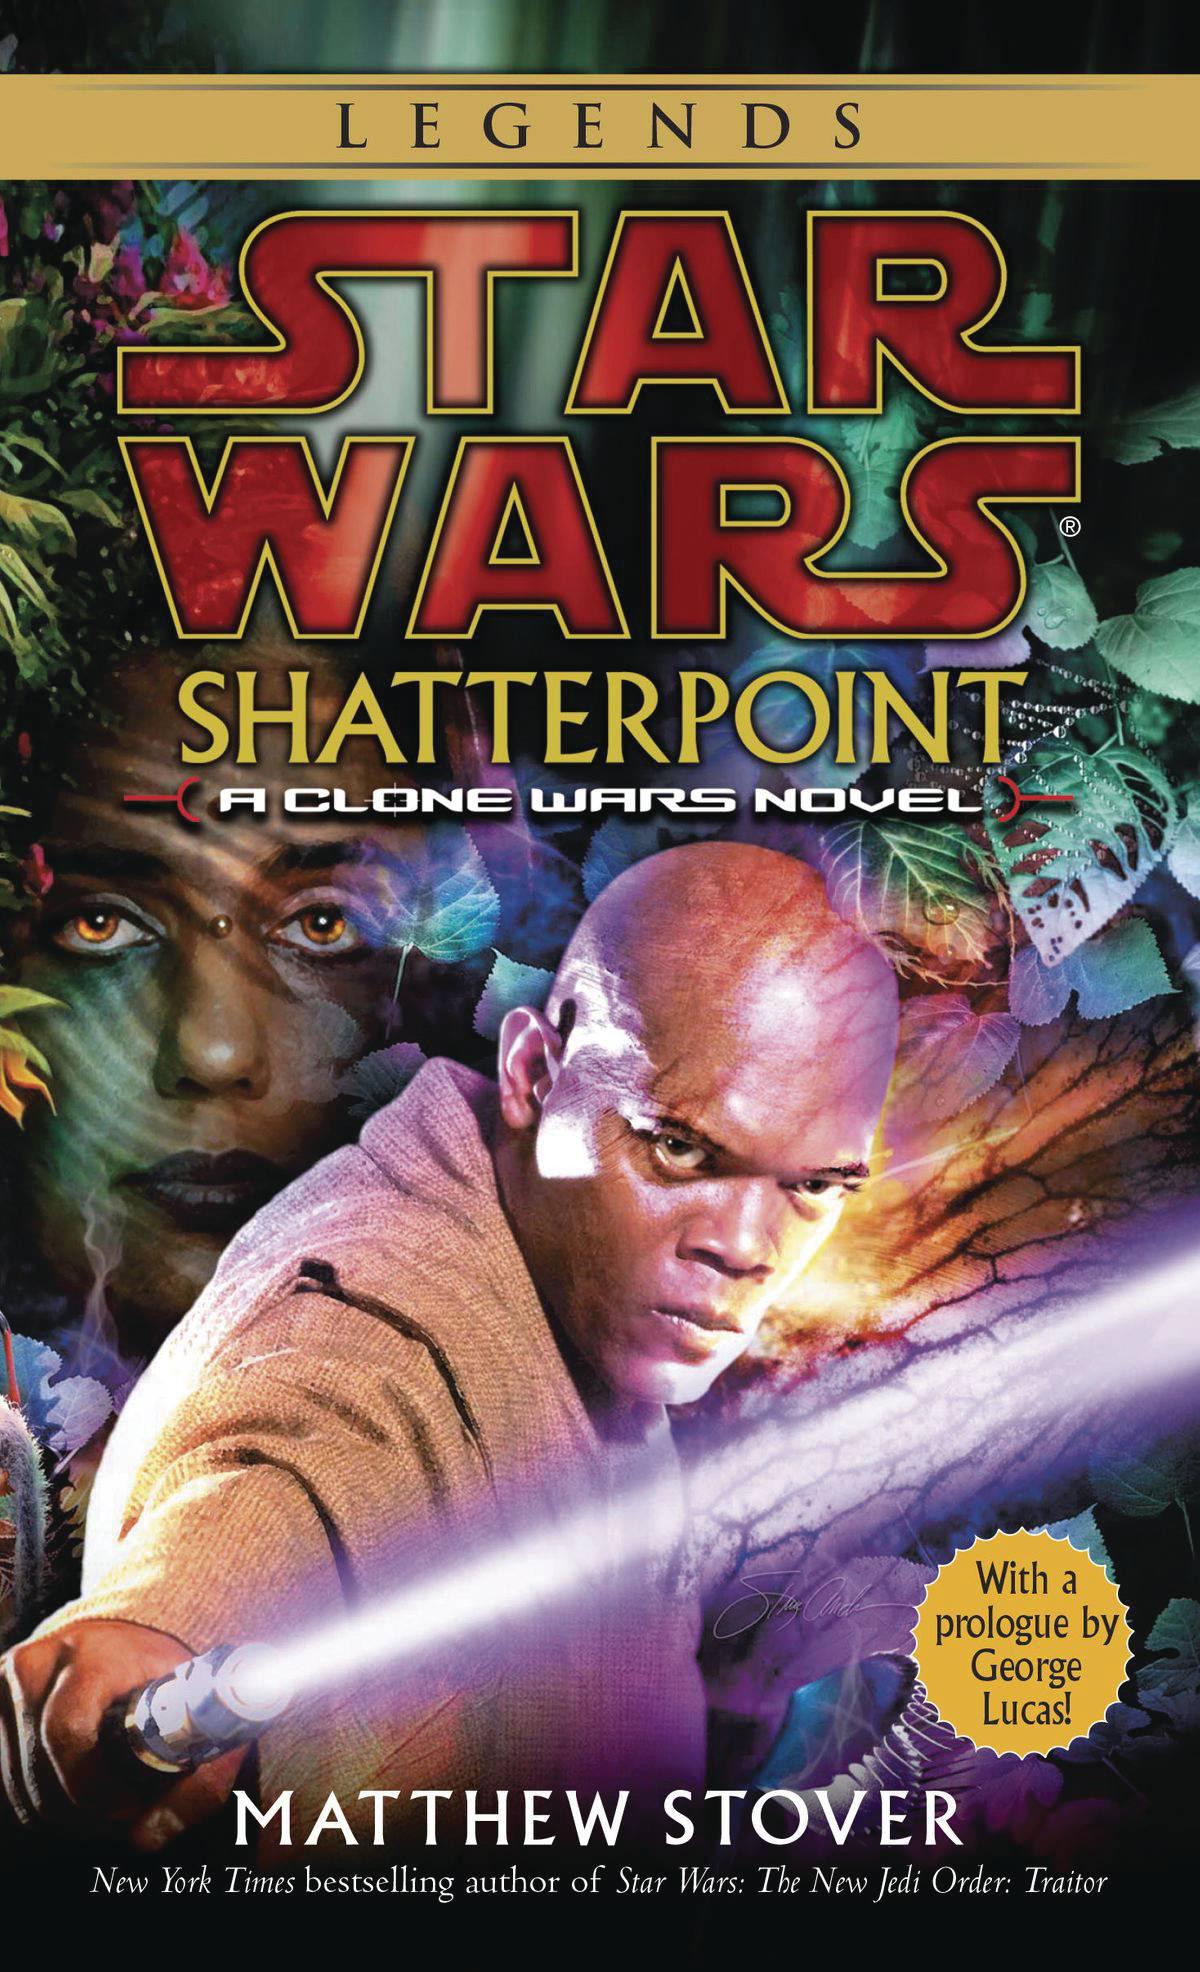 File:Shatterpoint-Legends.png